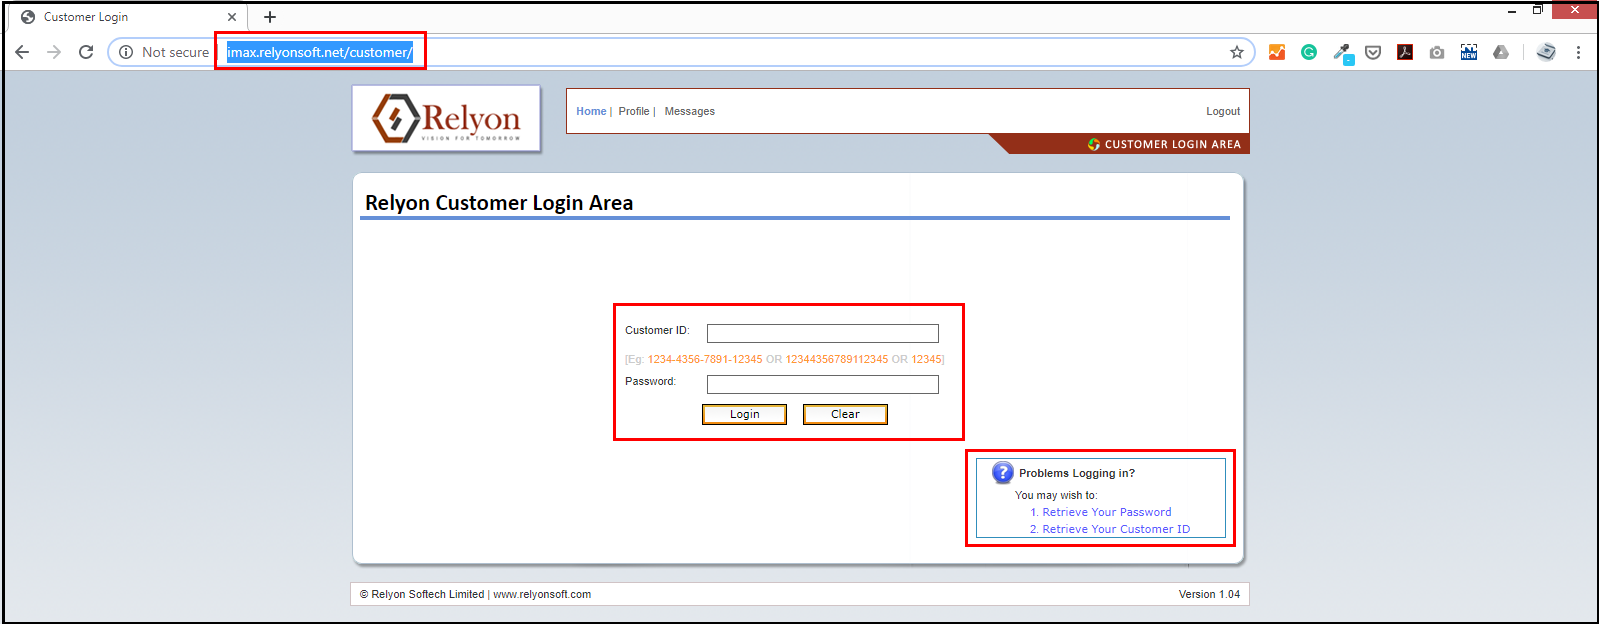 1.1.Procedure for software update in Saral TDS-customer portal.